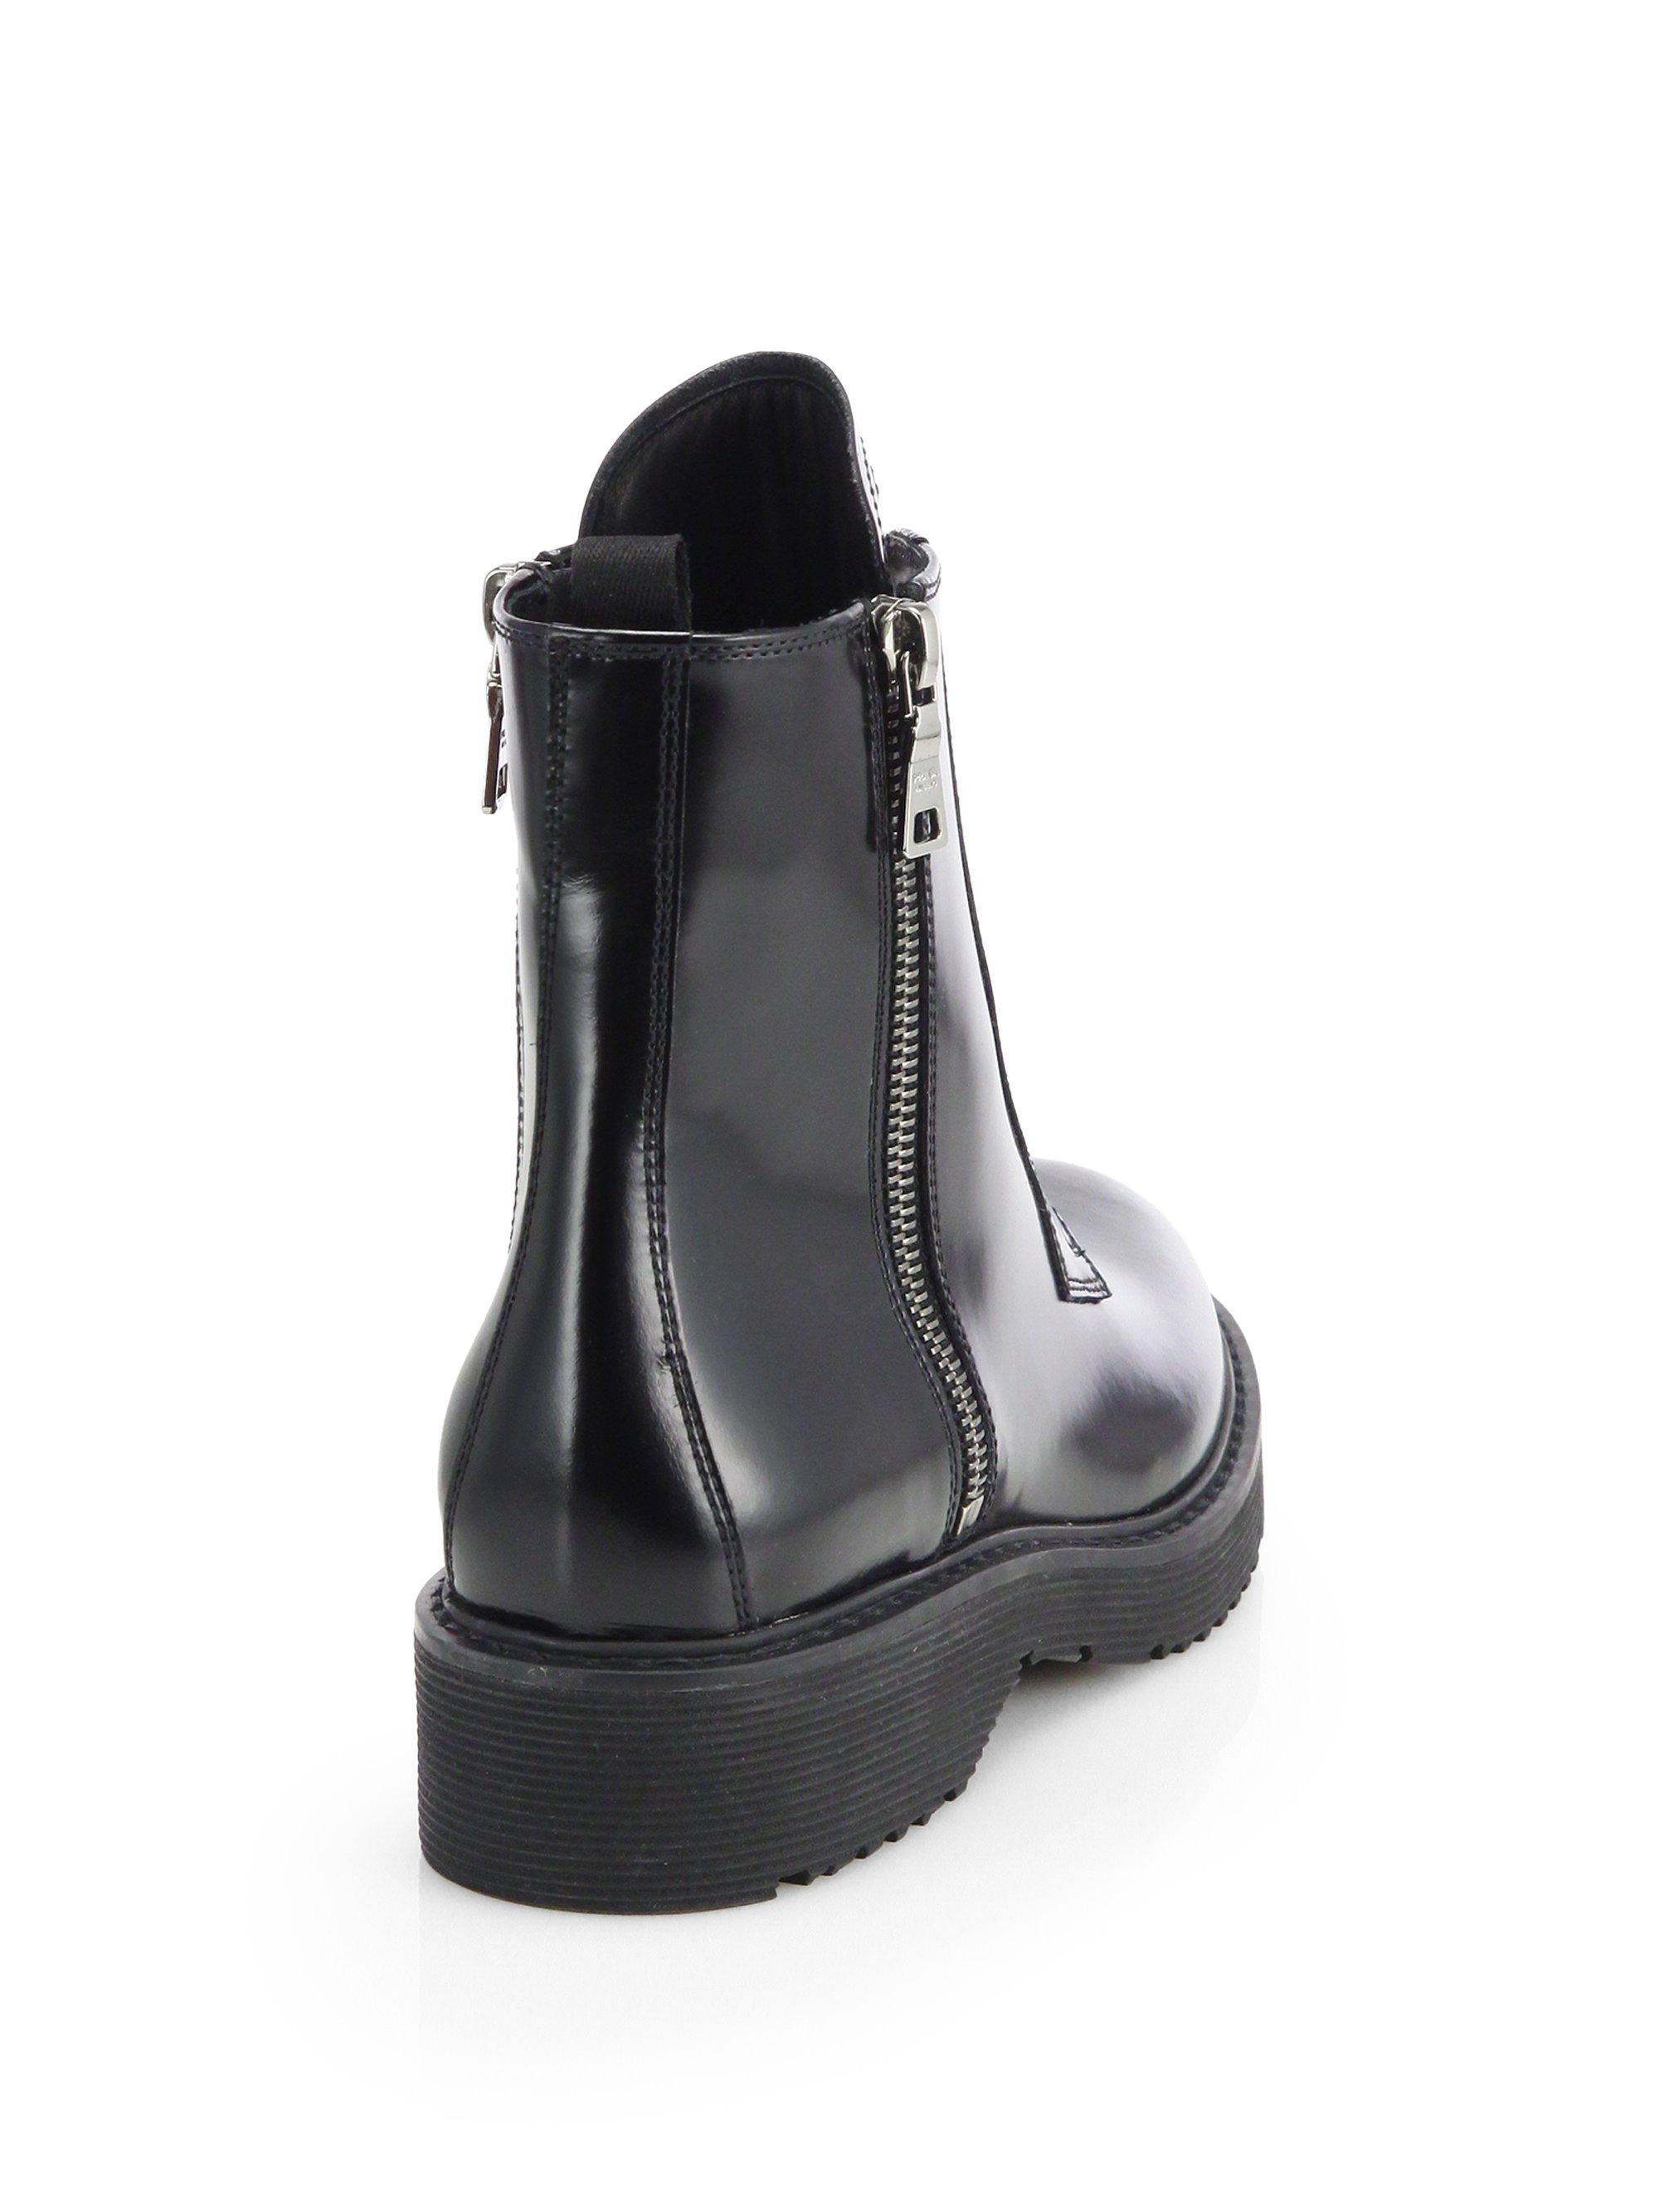 504ac2b4b31 Prada Black Patent Leather Laceup Combat Boots